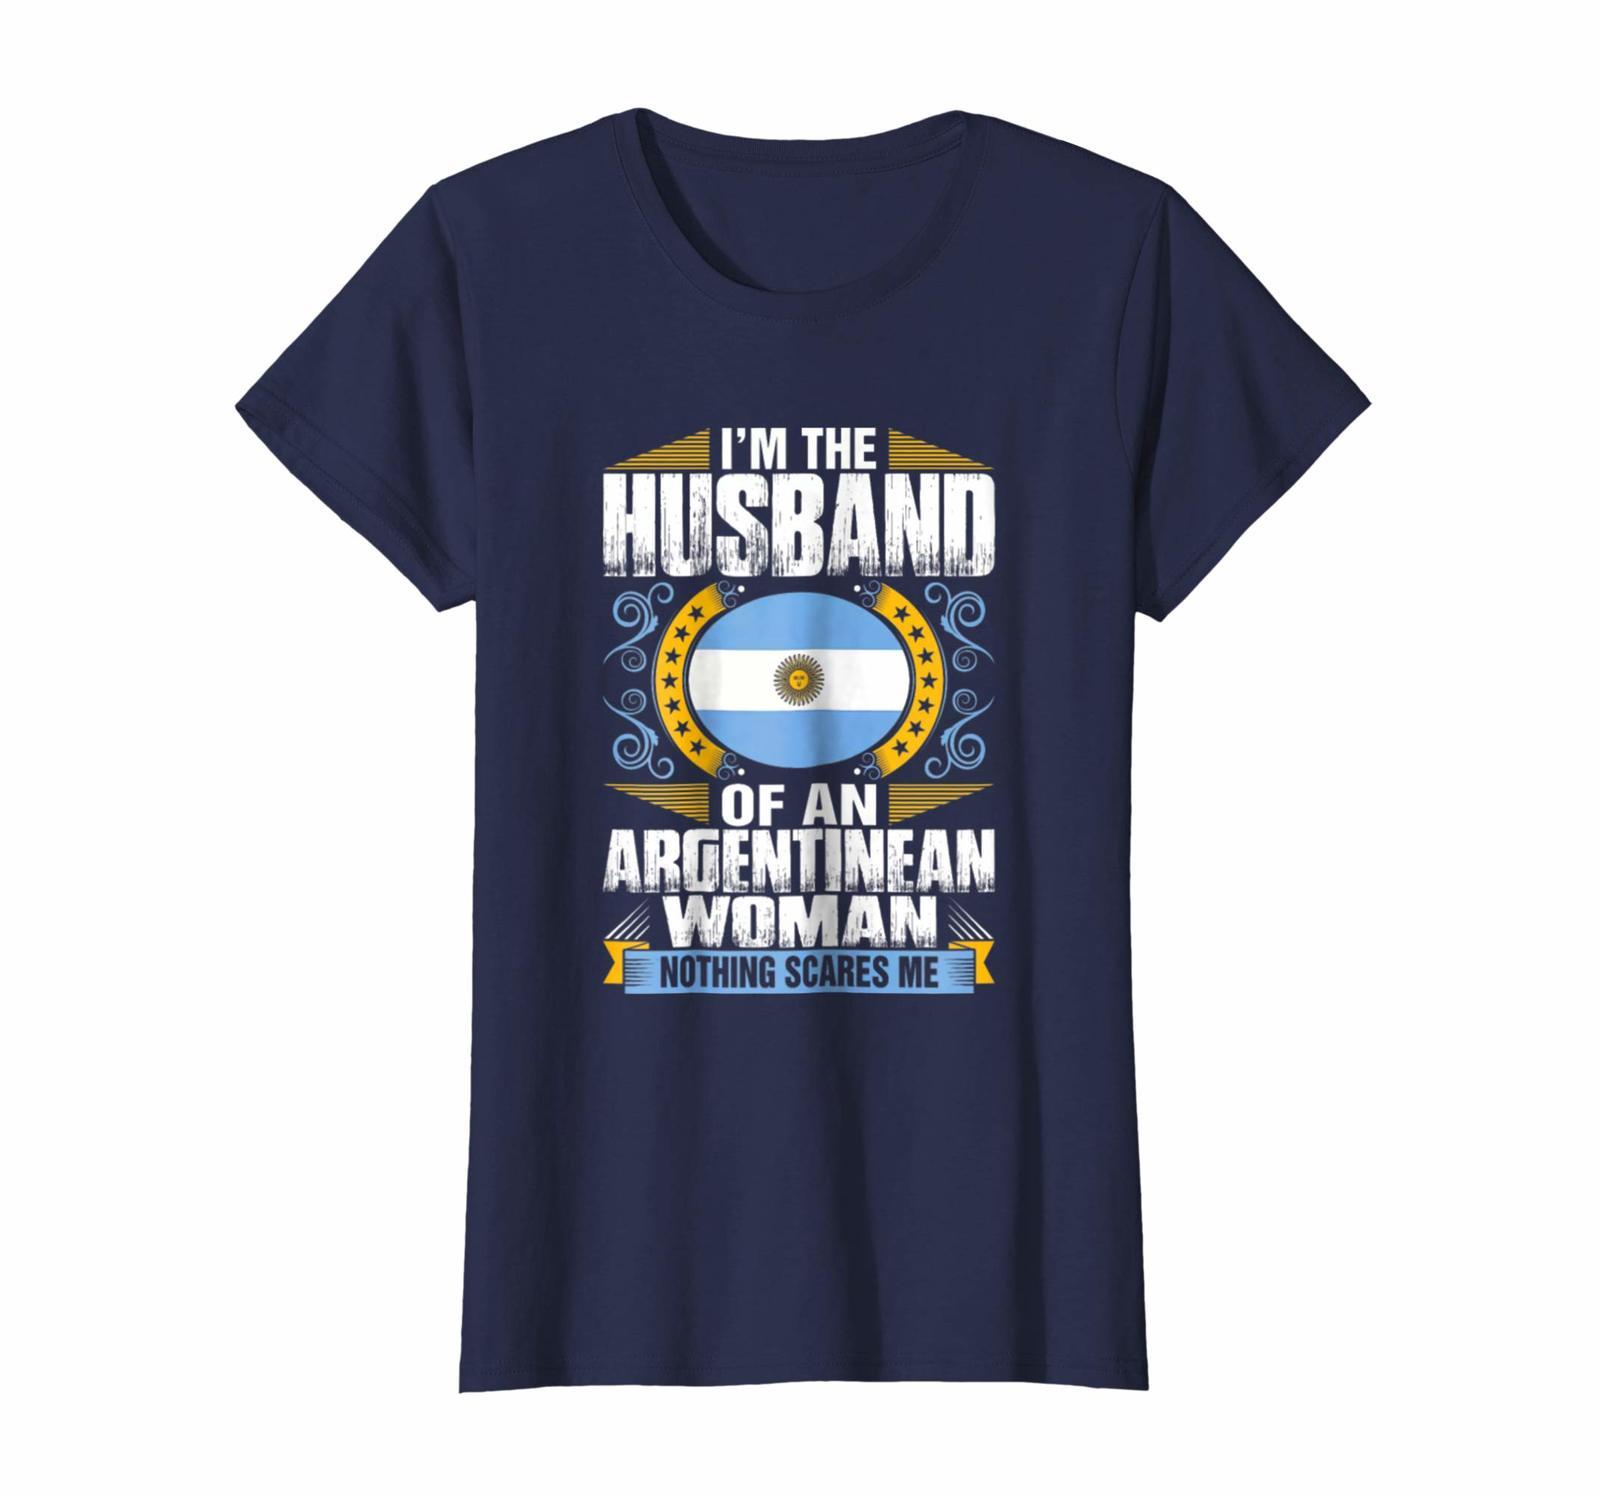 New Shirts - I'm The Husband Argentina Women Flag Men Women Gift T Shirt Wowen